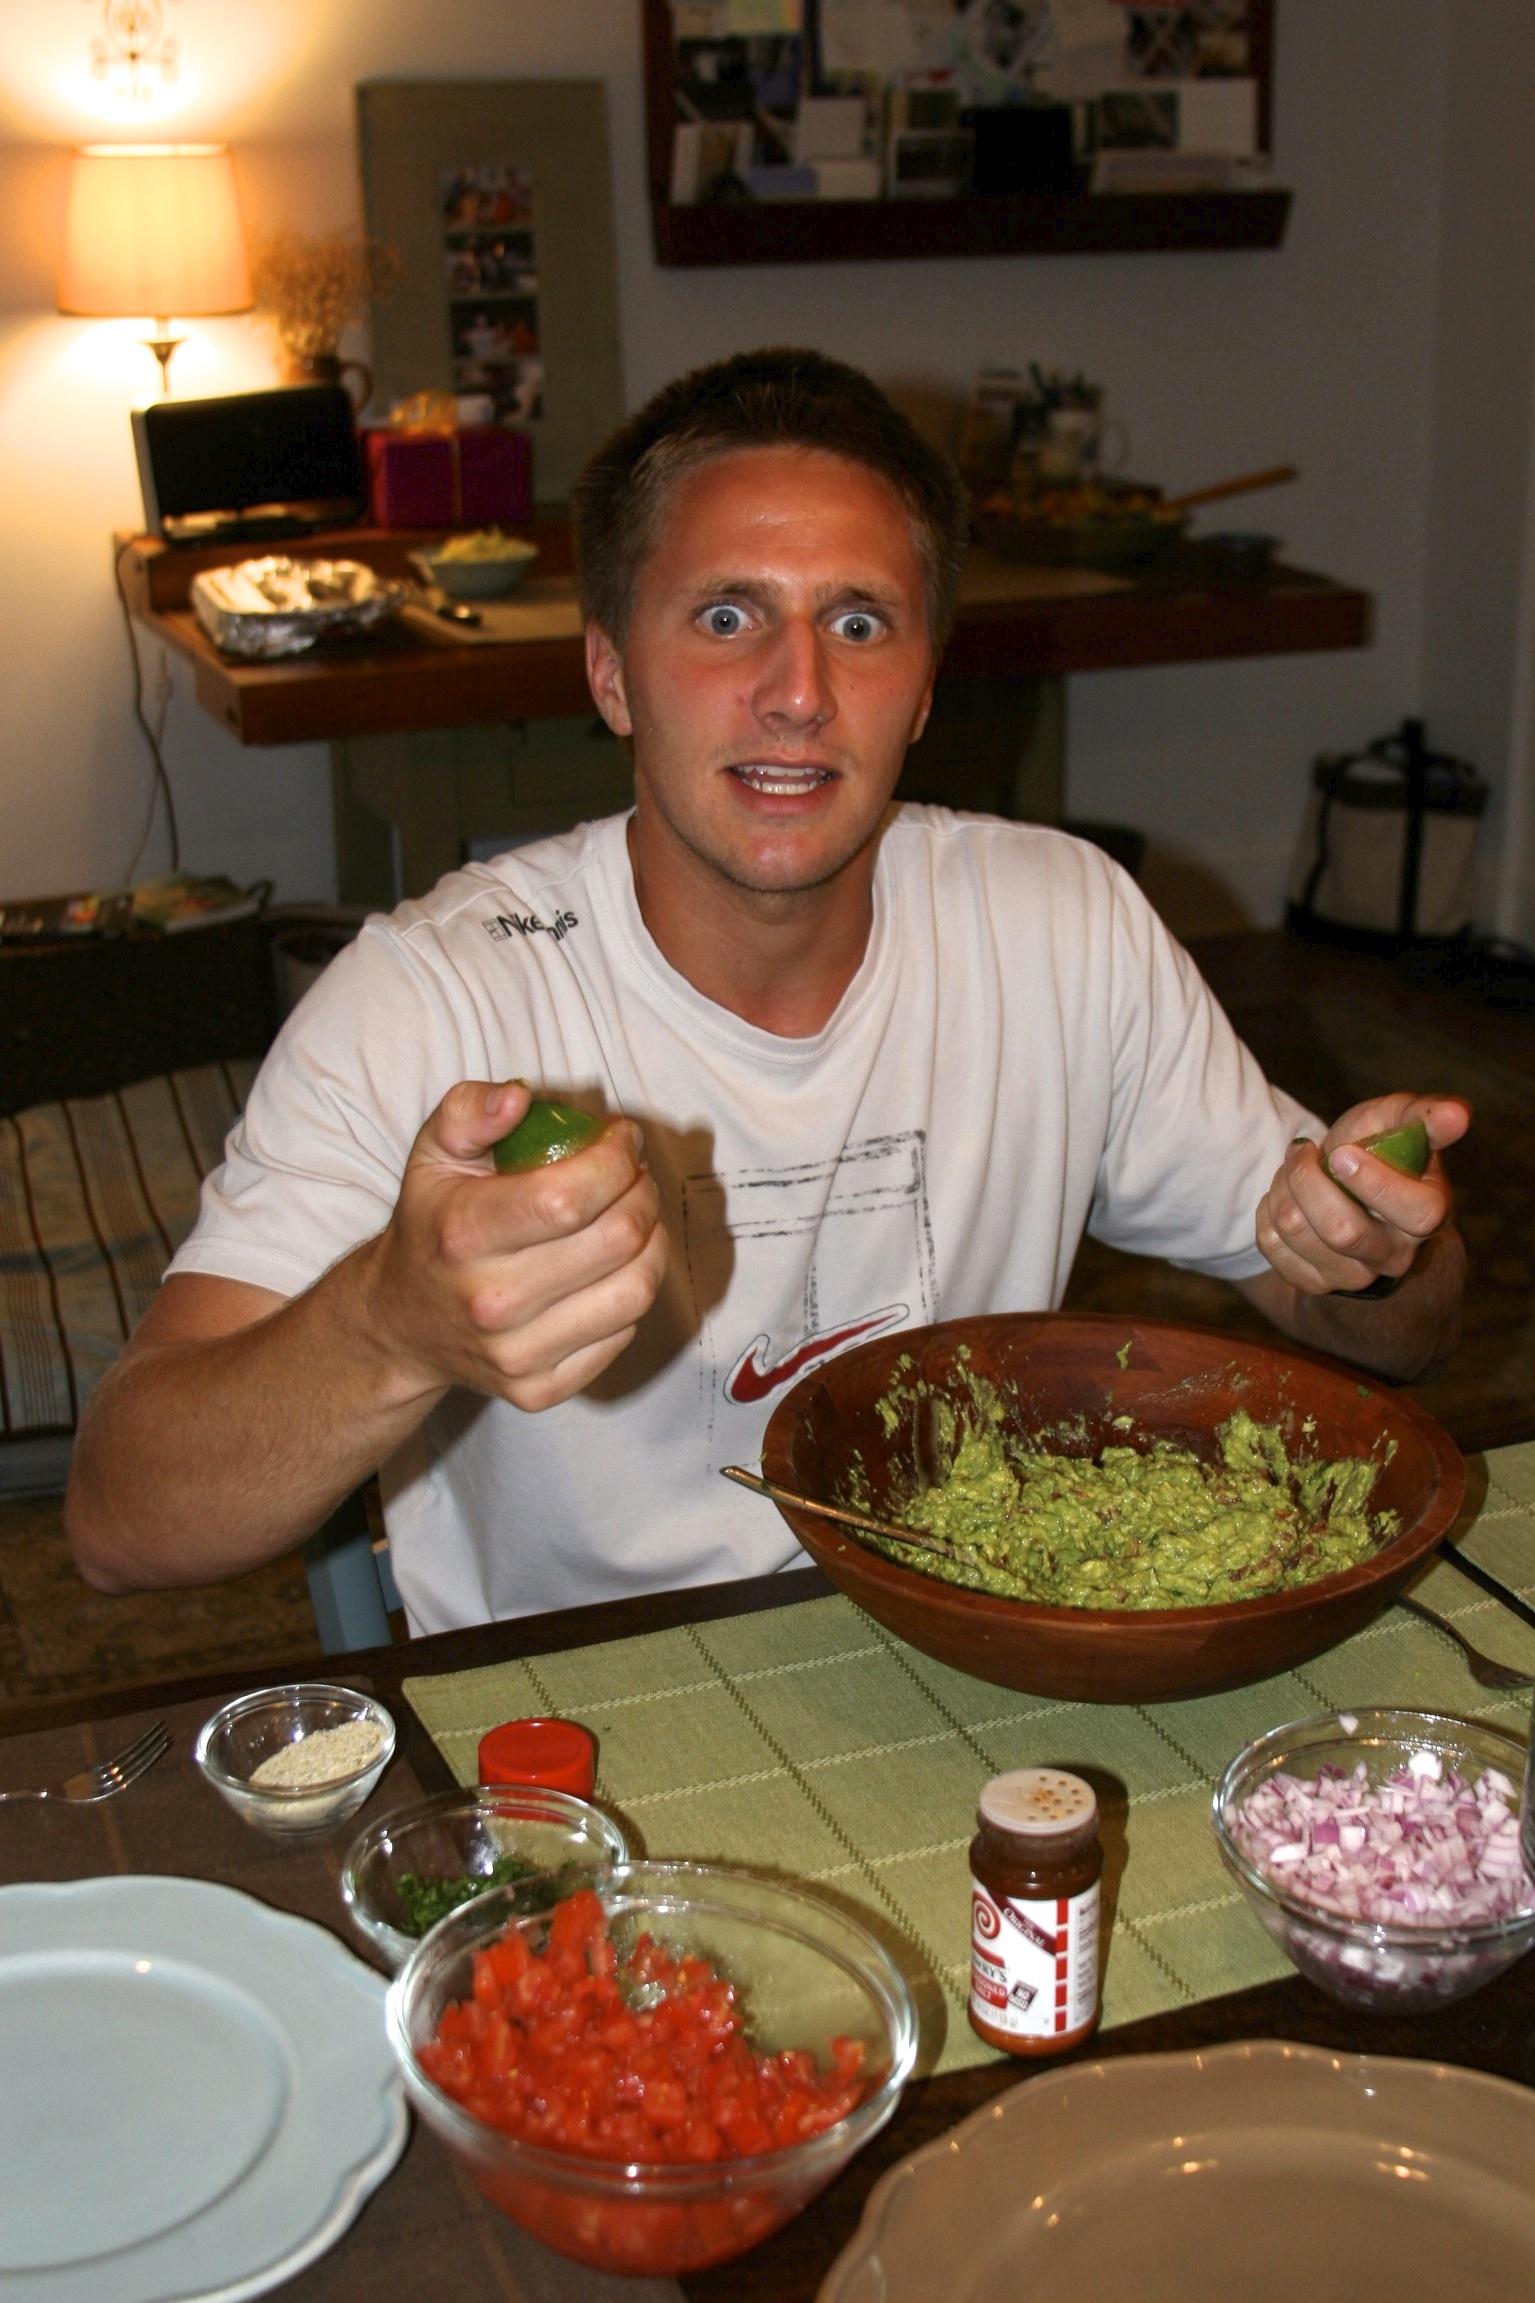 P-Dawg and his guacamole